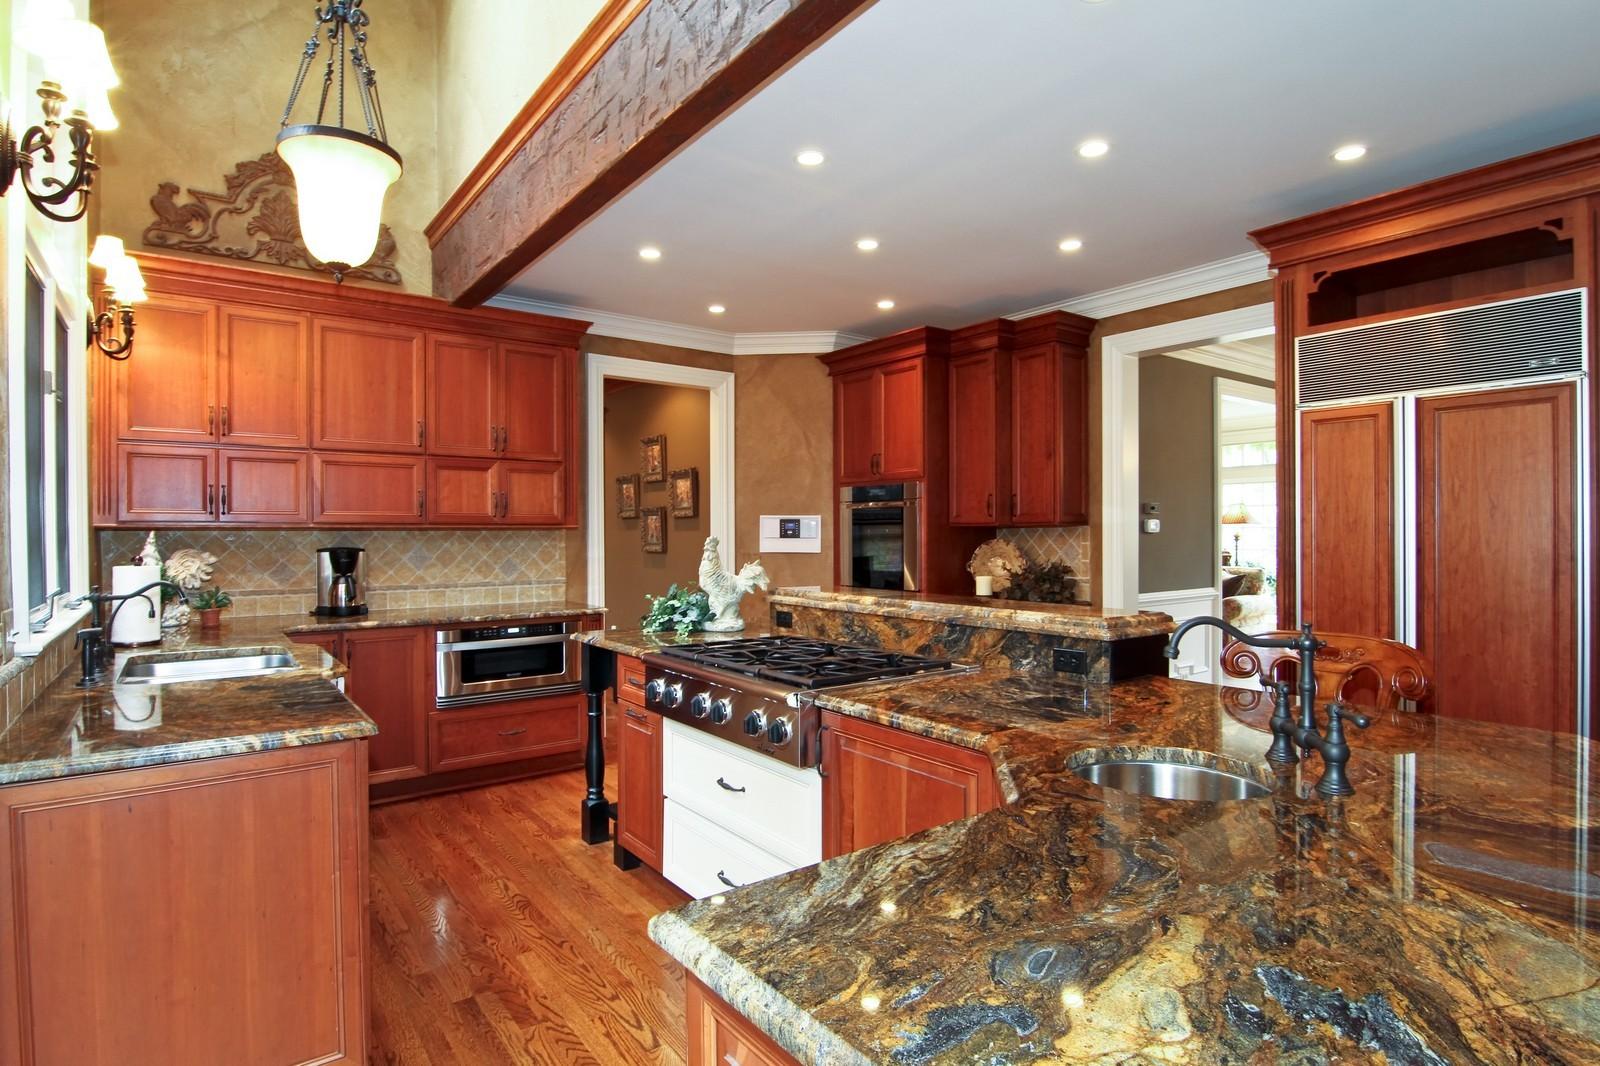 Real Estate Photography - 810 Fox Glen Drive, St. Charles, IL, 60174 - Kitchen